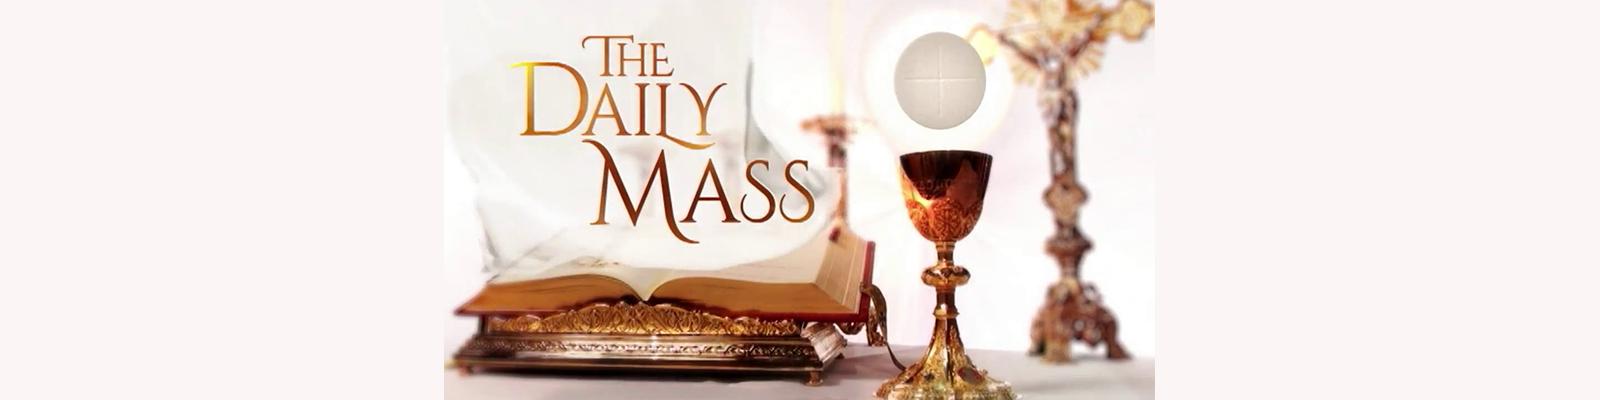 Daily Mass Schedule 1/14-1/19